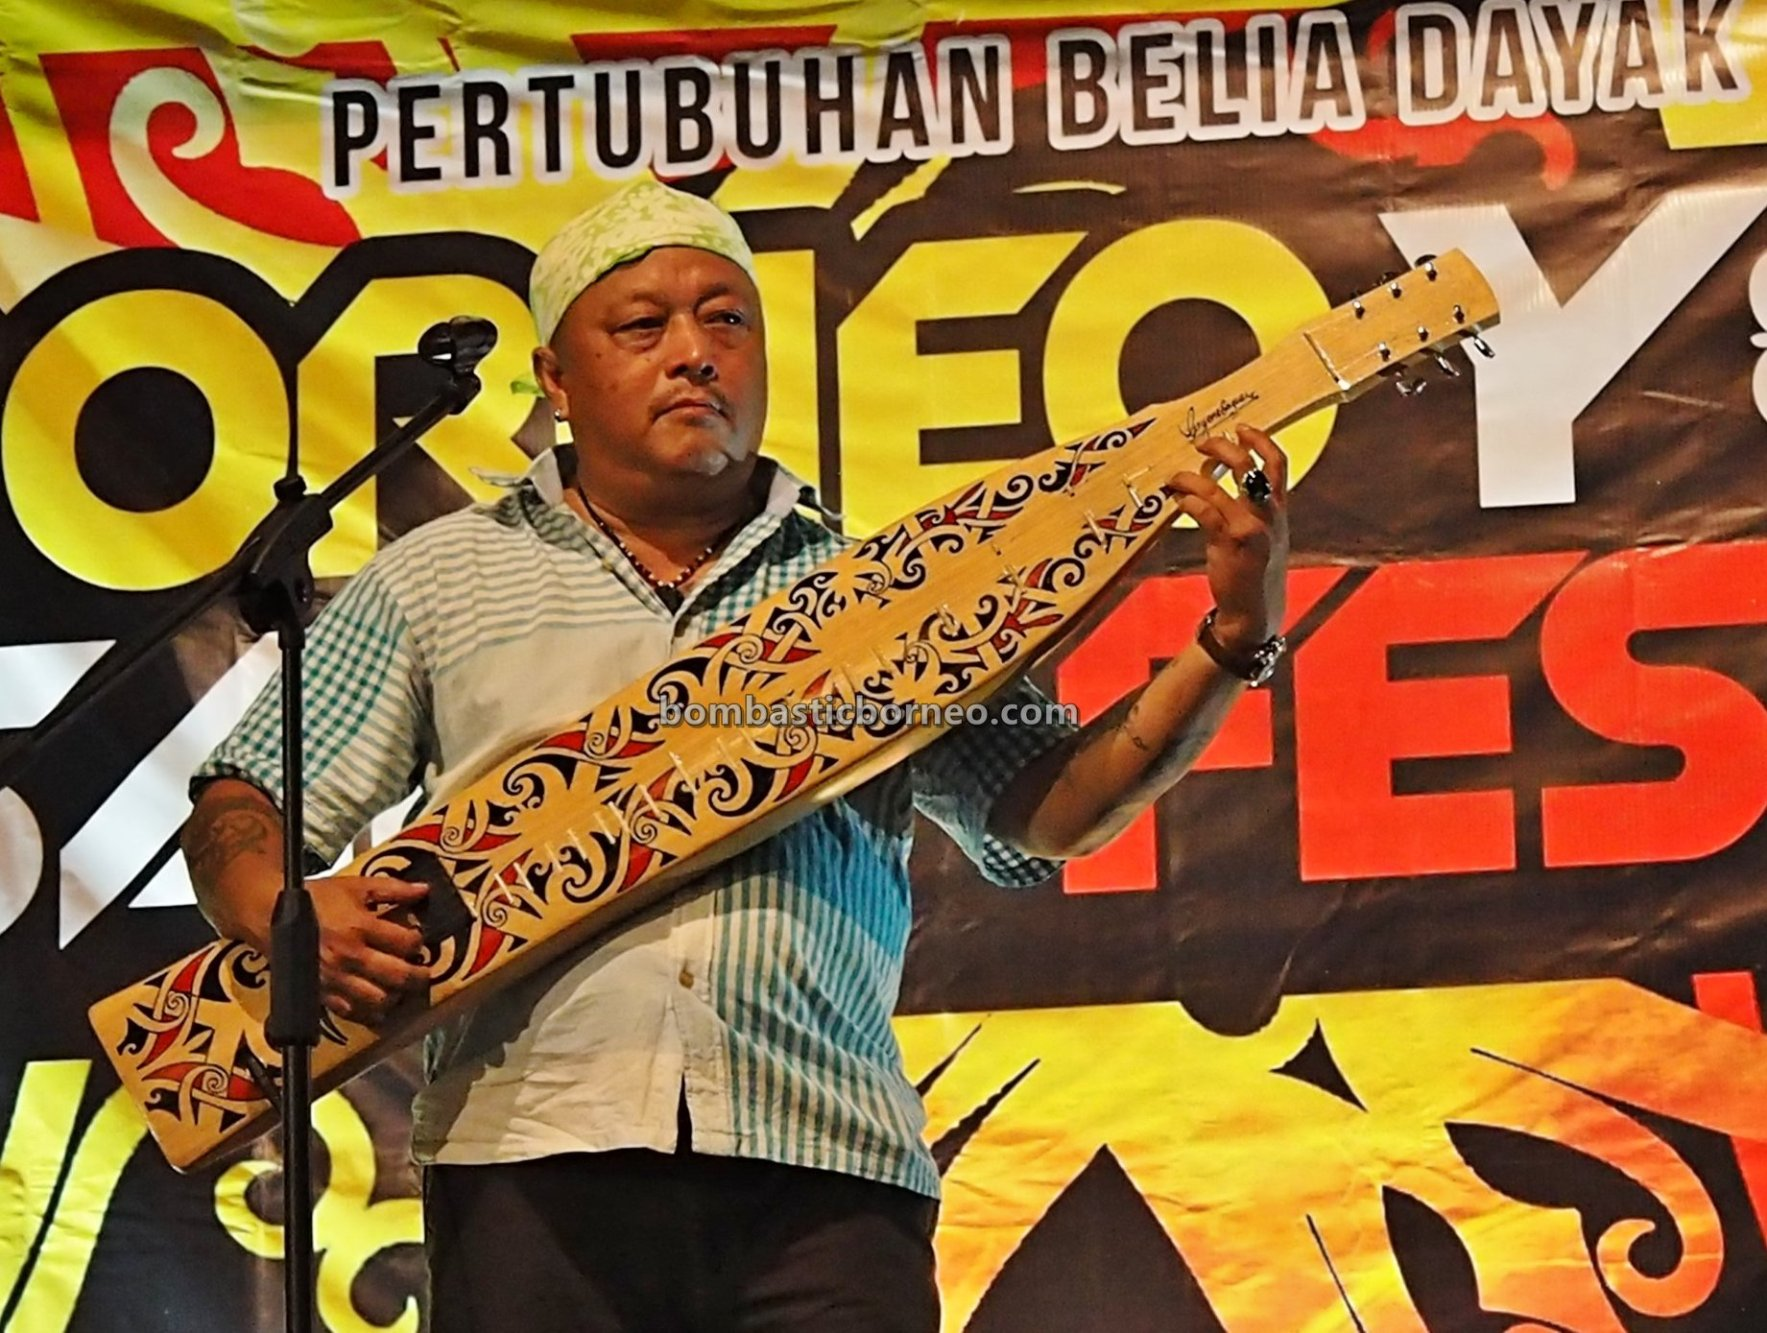 authentic, traditional, guitar, event, native orang ulu, musical instrument, Sibu, Tourism, tourist attraction, travel guide, 婆罗洲原住民吉他, 砂拉越达雅沙贝, 马来西亚音乐文化,